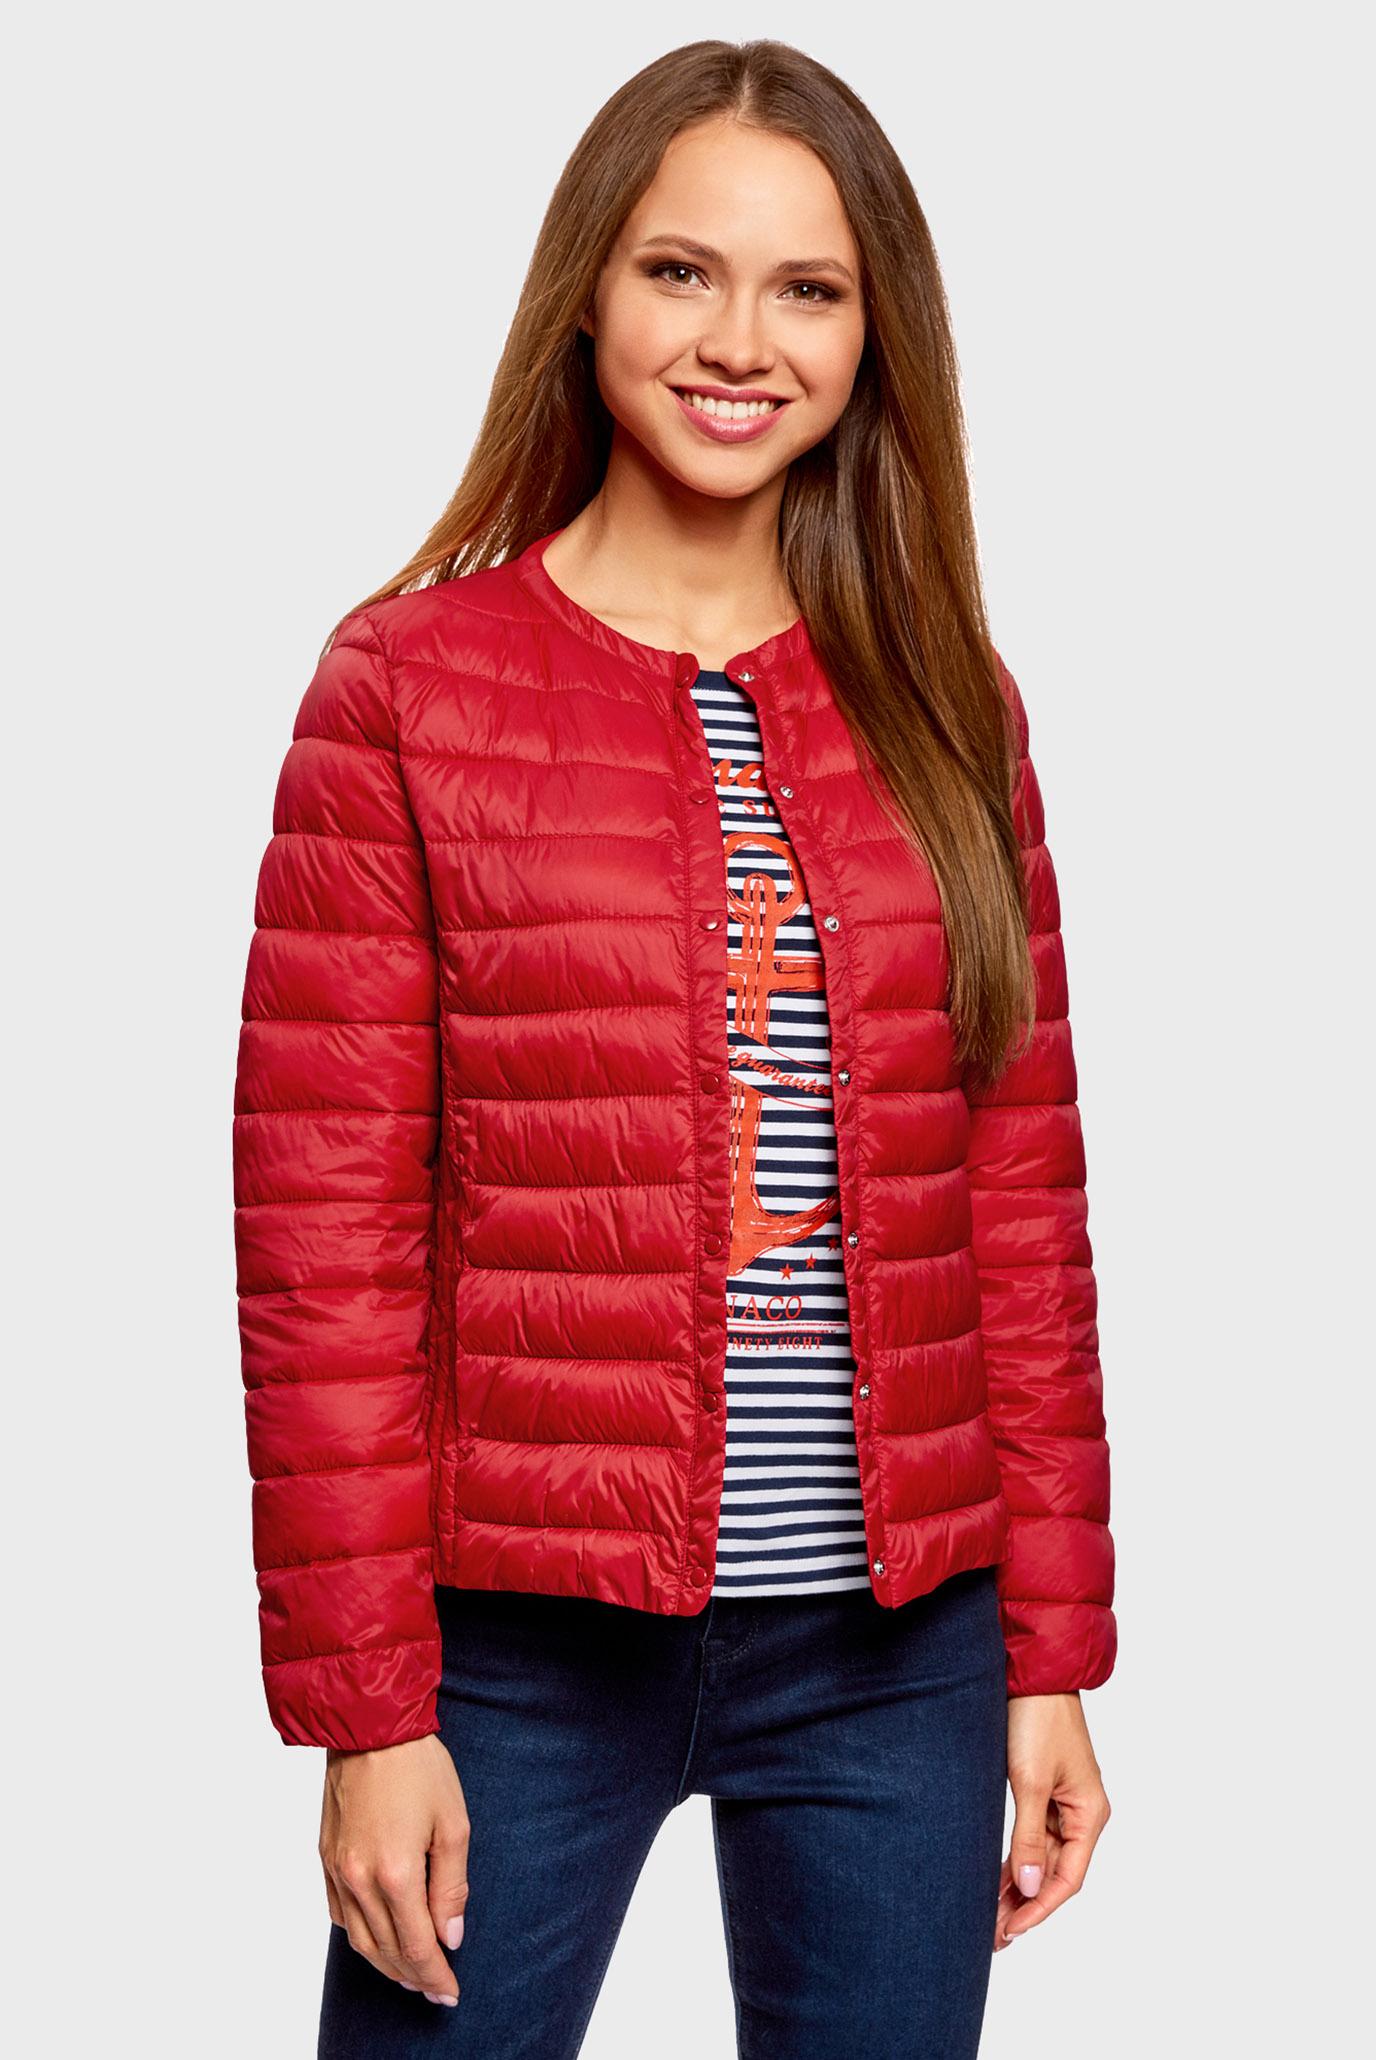 b4ca0bf4e7a Купить Женская красная стеганая куртка exclusive Oodji Oodji  10204040B 45638 4500N – Киев